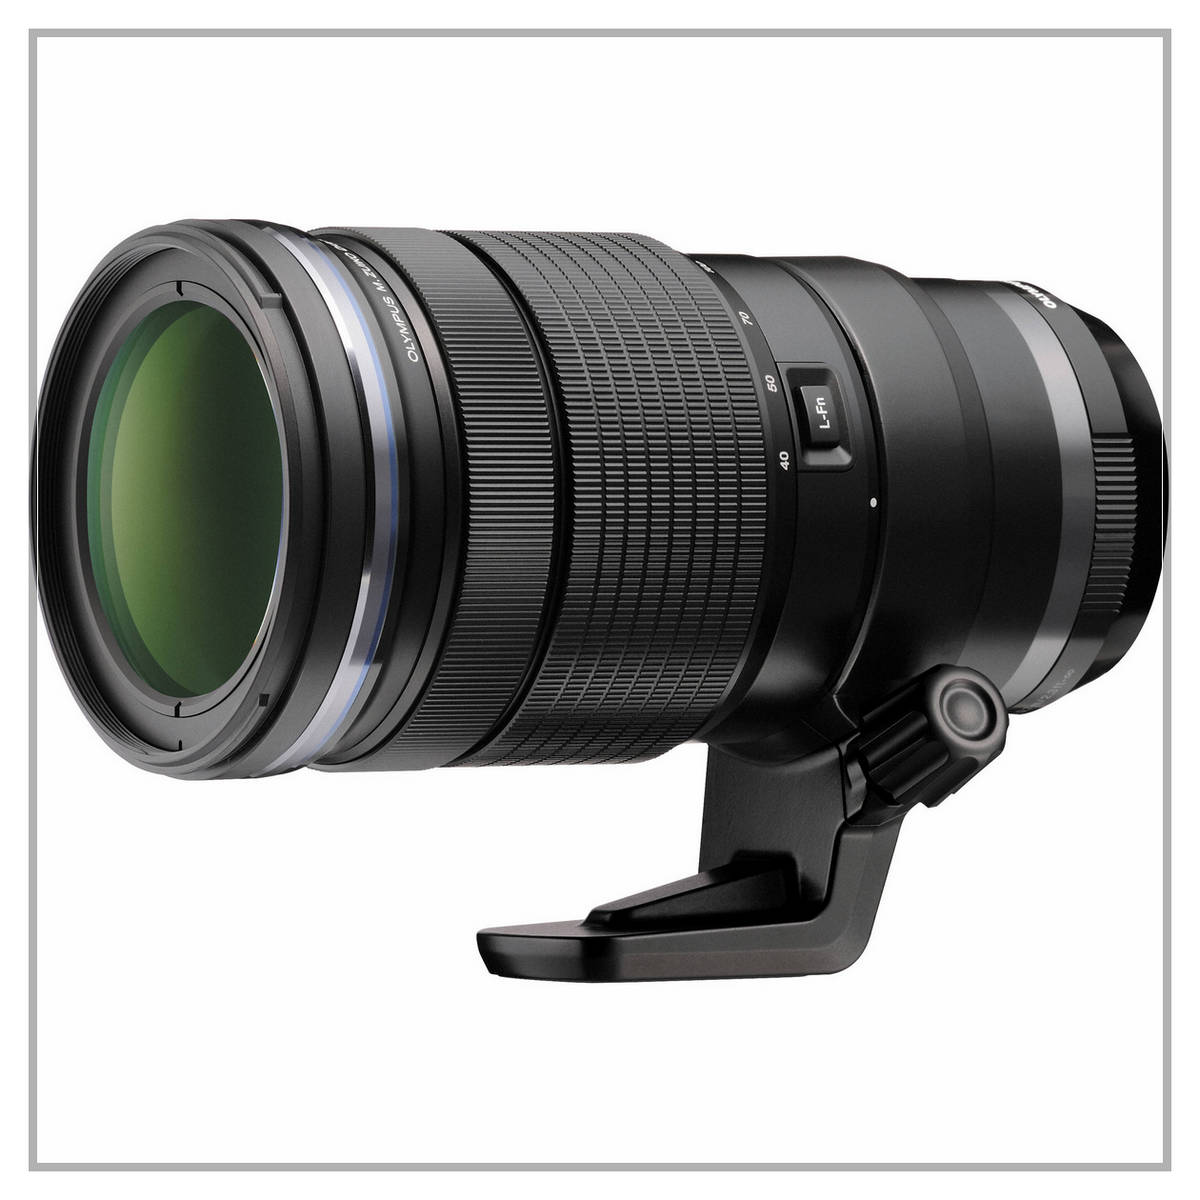 Olympus M.Zuiko Digital ED 40-150 f2.8 Pro